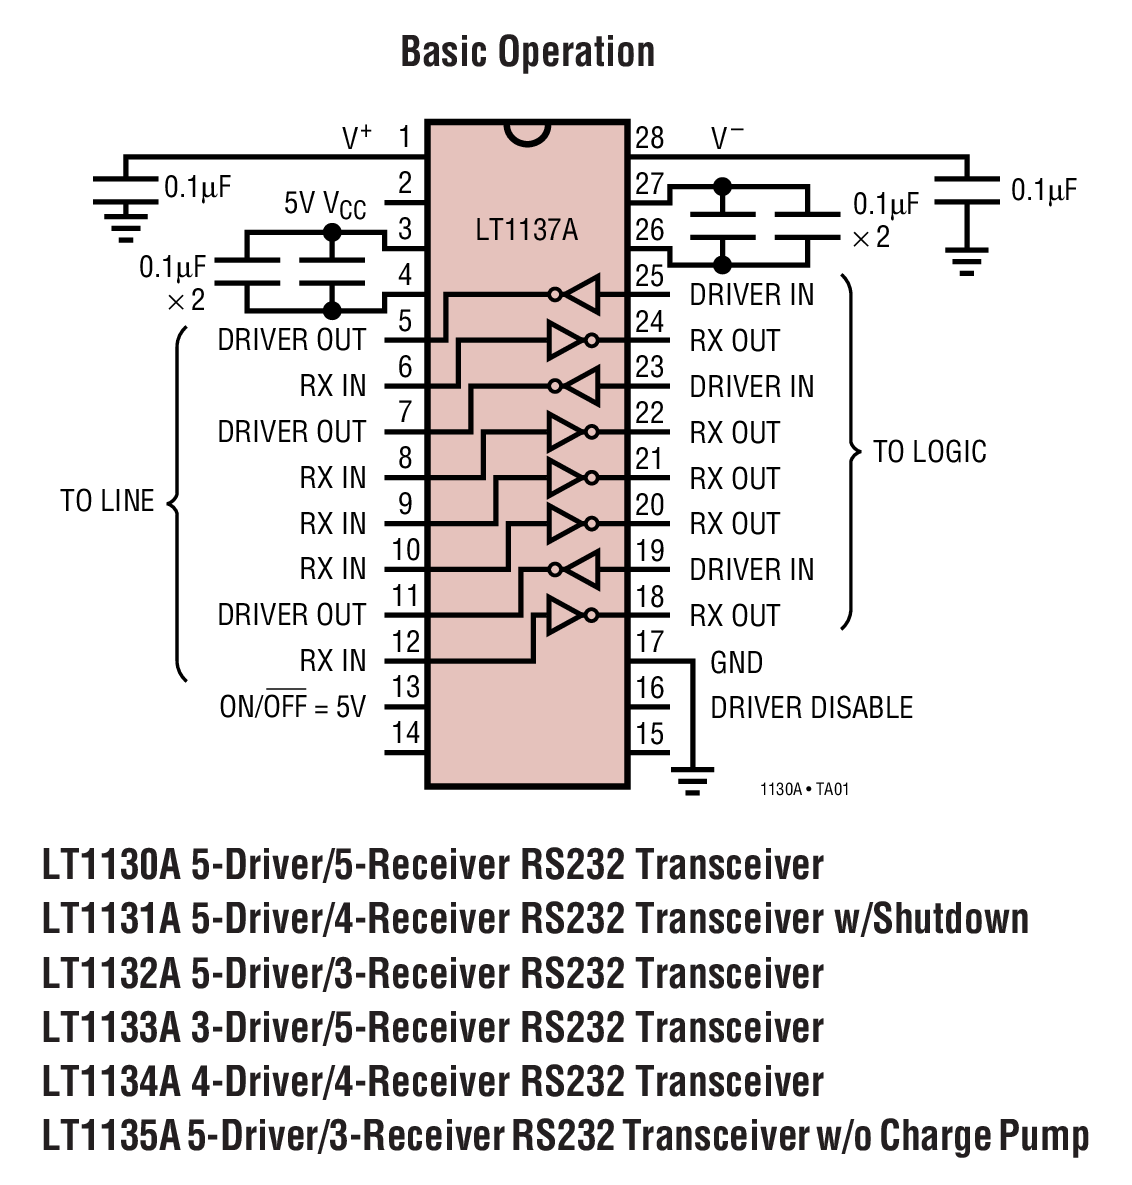 LT1130A 采用小電容器的先進低功率 5V RS232 驅動器 / 接收器